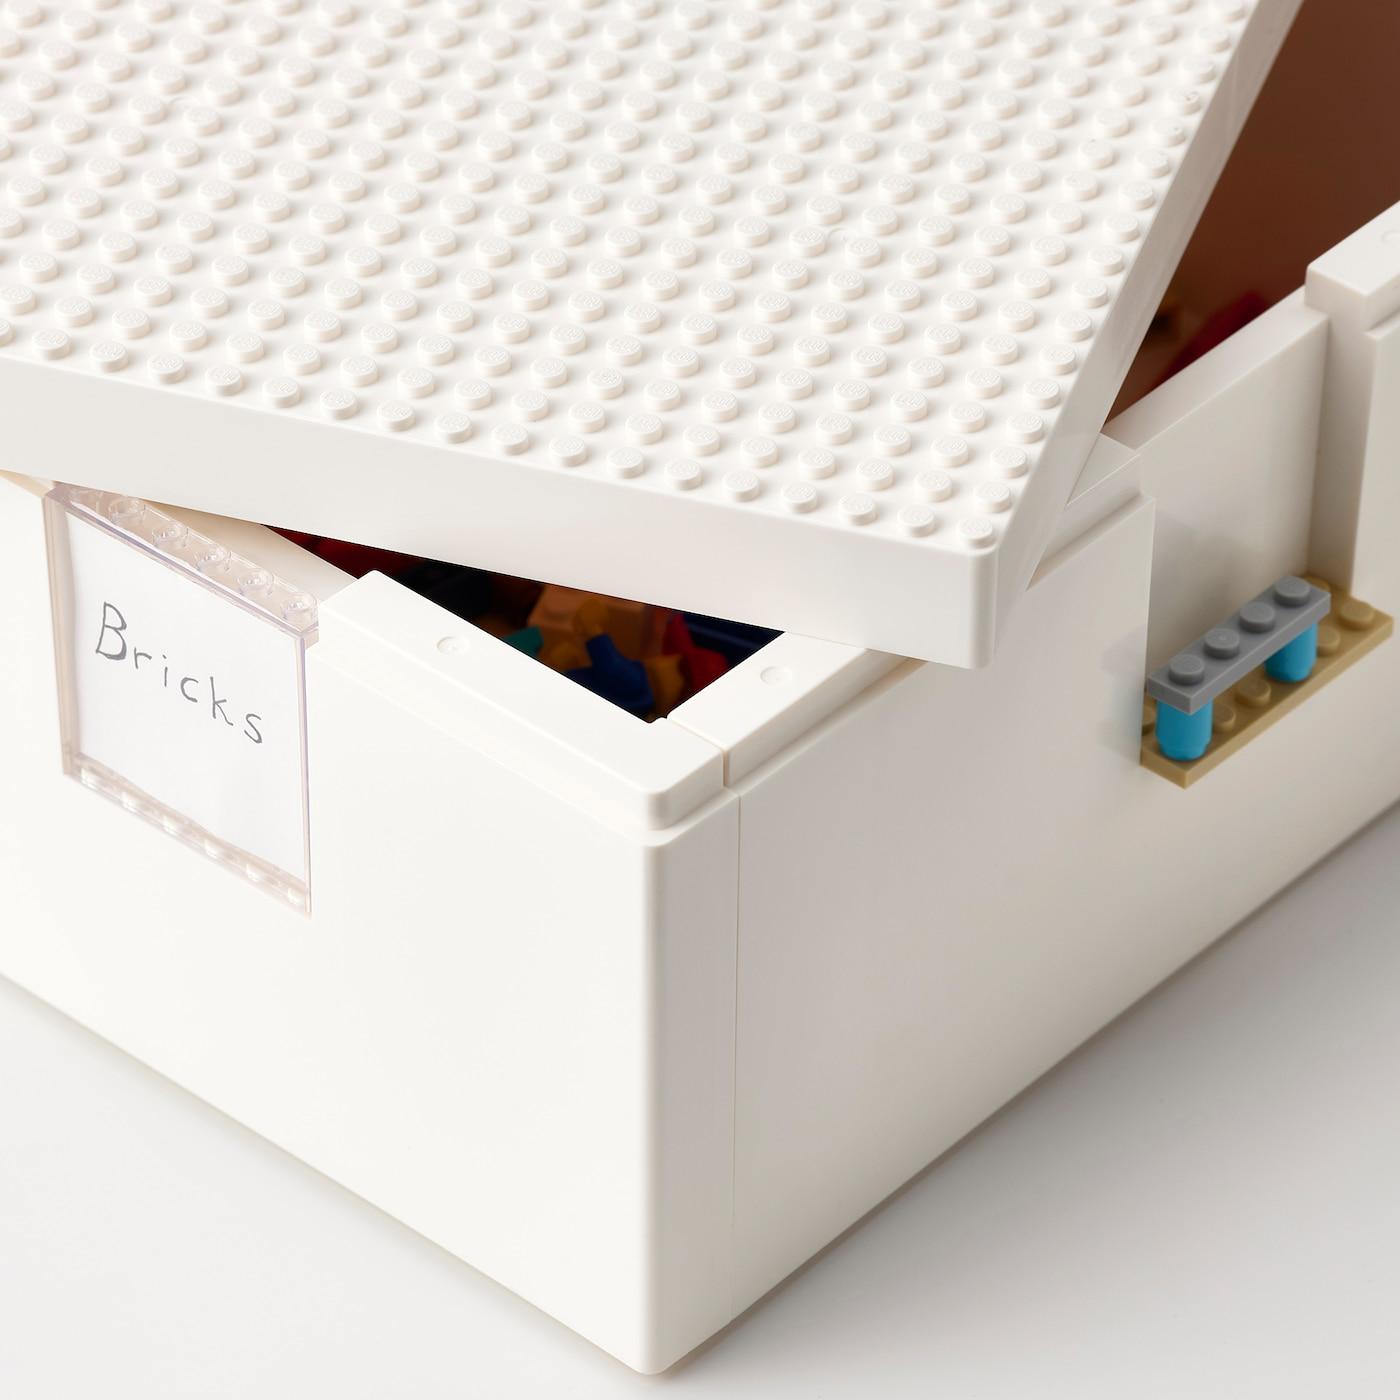 BYGGLEK LEGO® kutija s poklopcem, bela, 26x18x12 cm